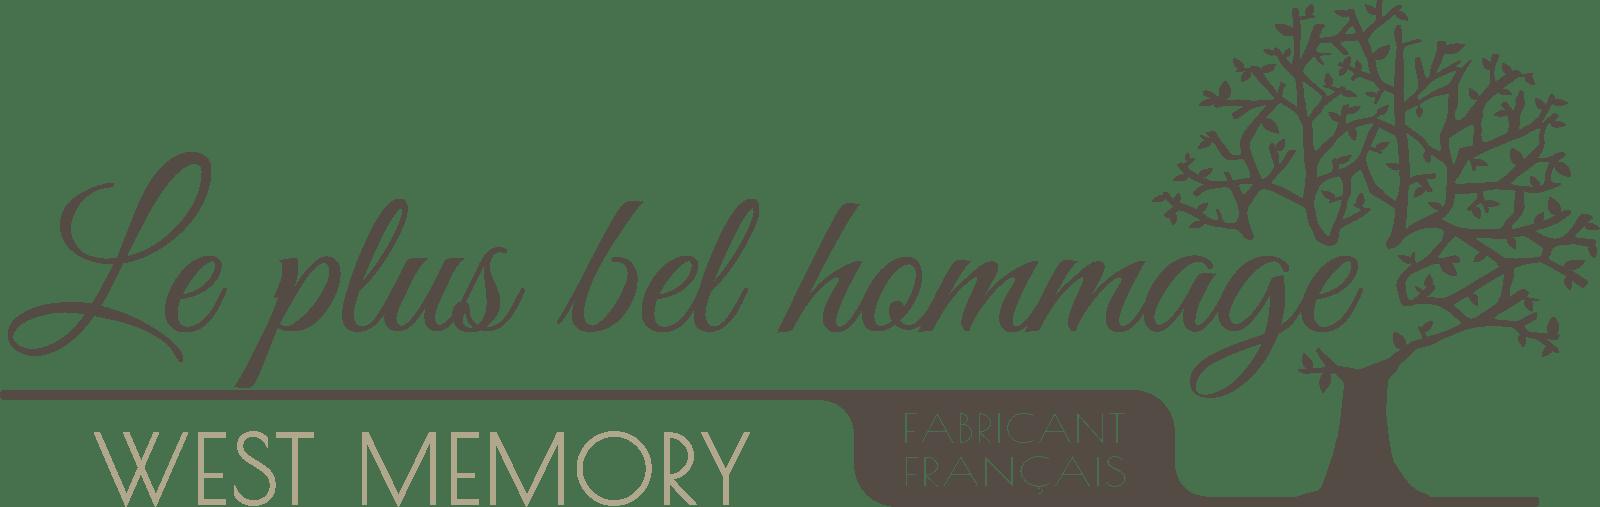 logo Westmemory